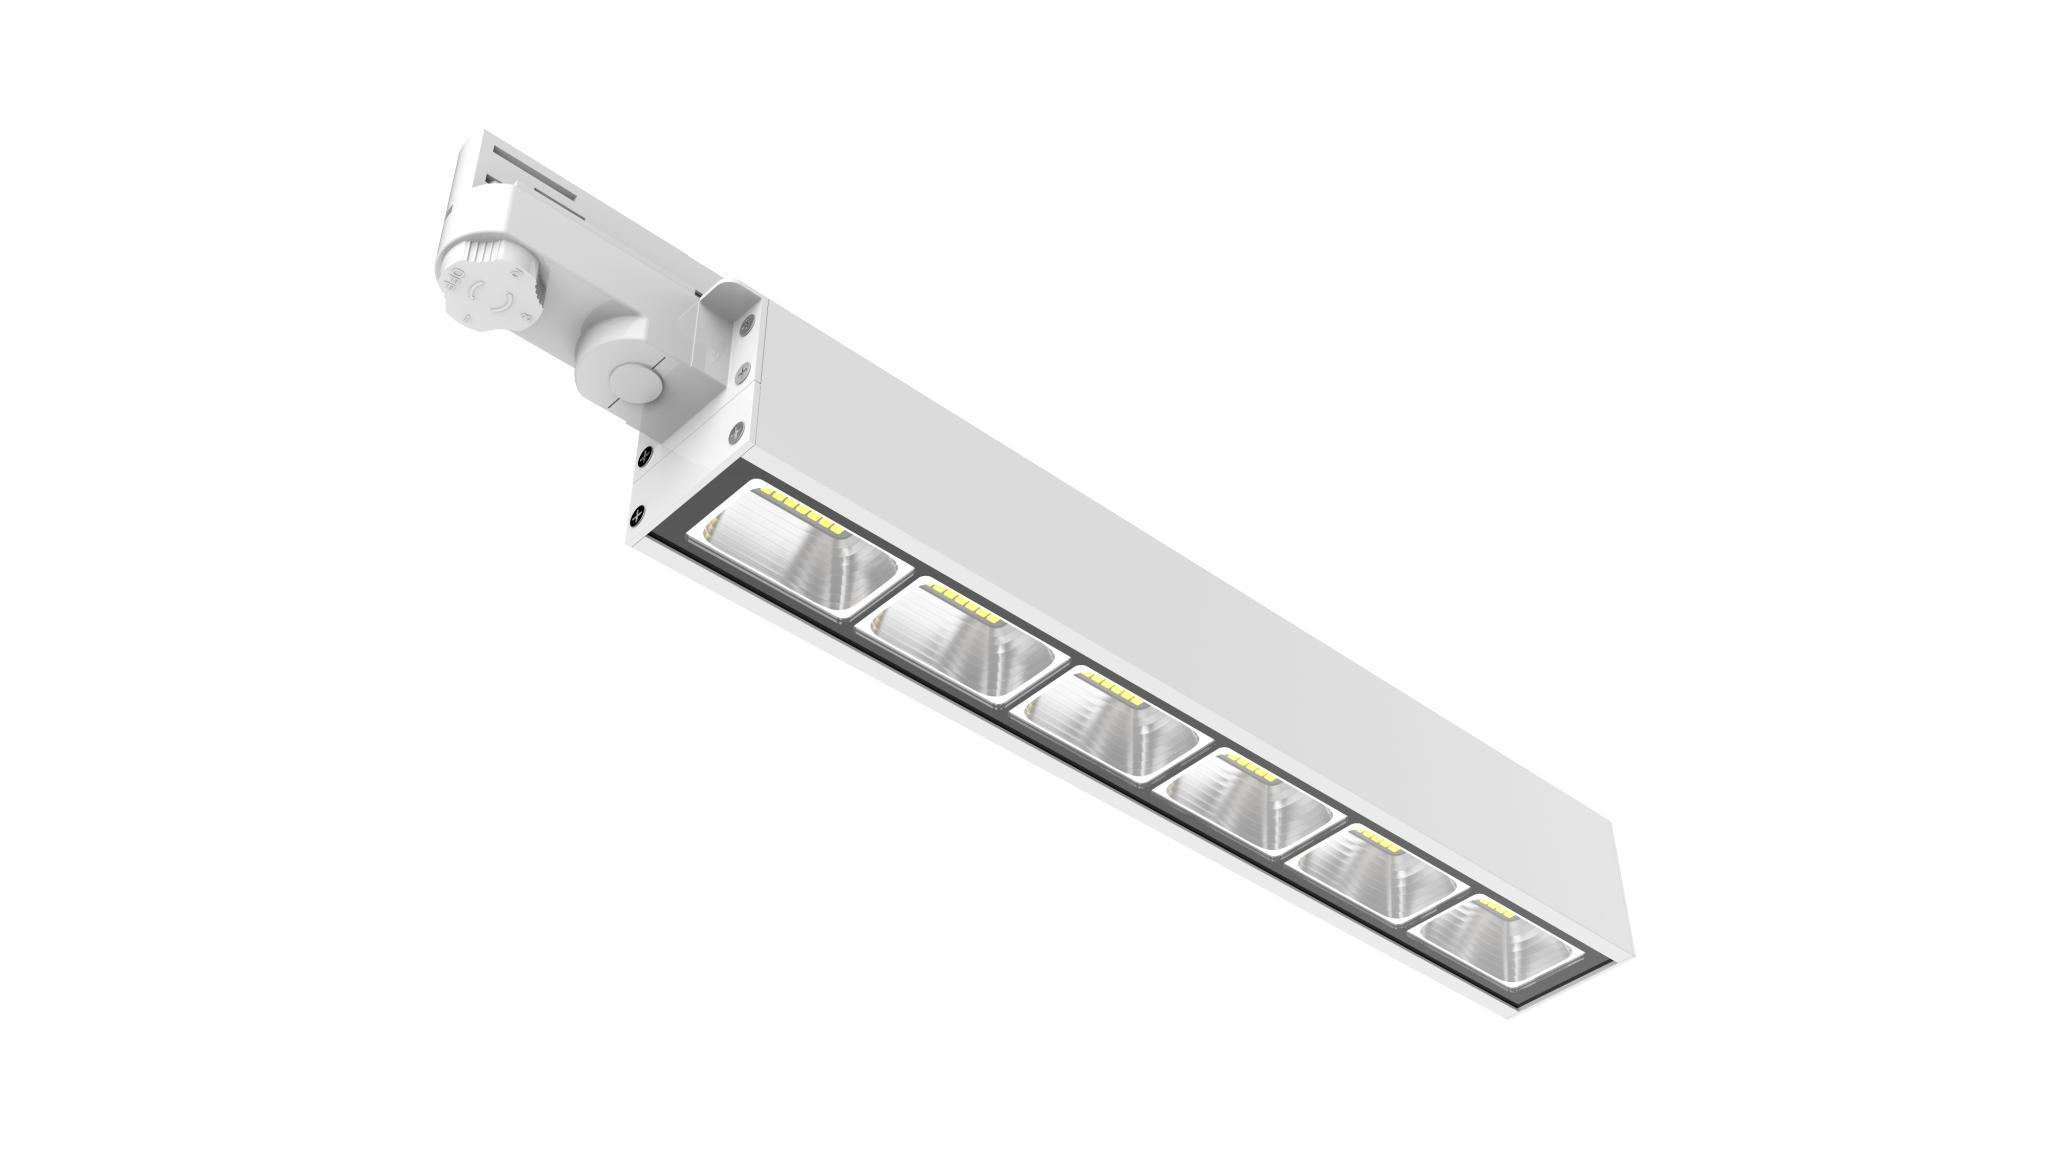 Dali dimming Linear LED Track Light 40w 130lm/w 3 Circuits 2